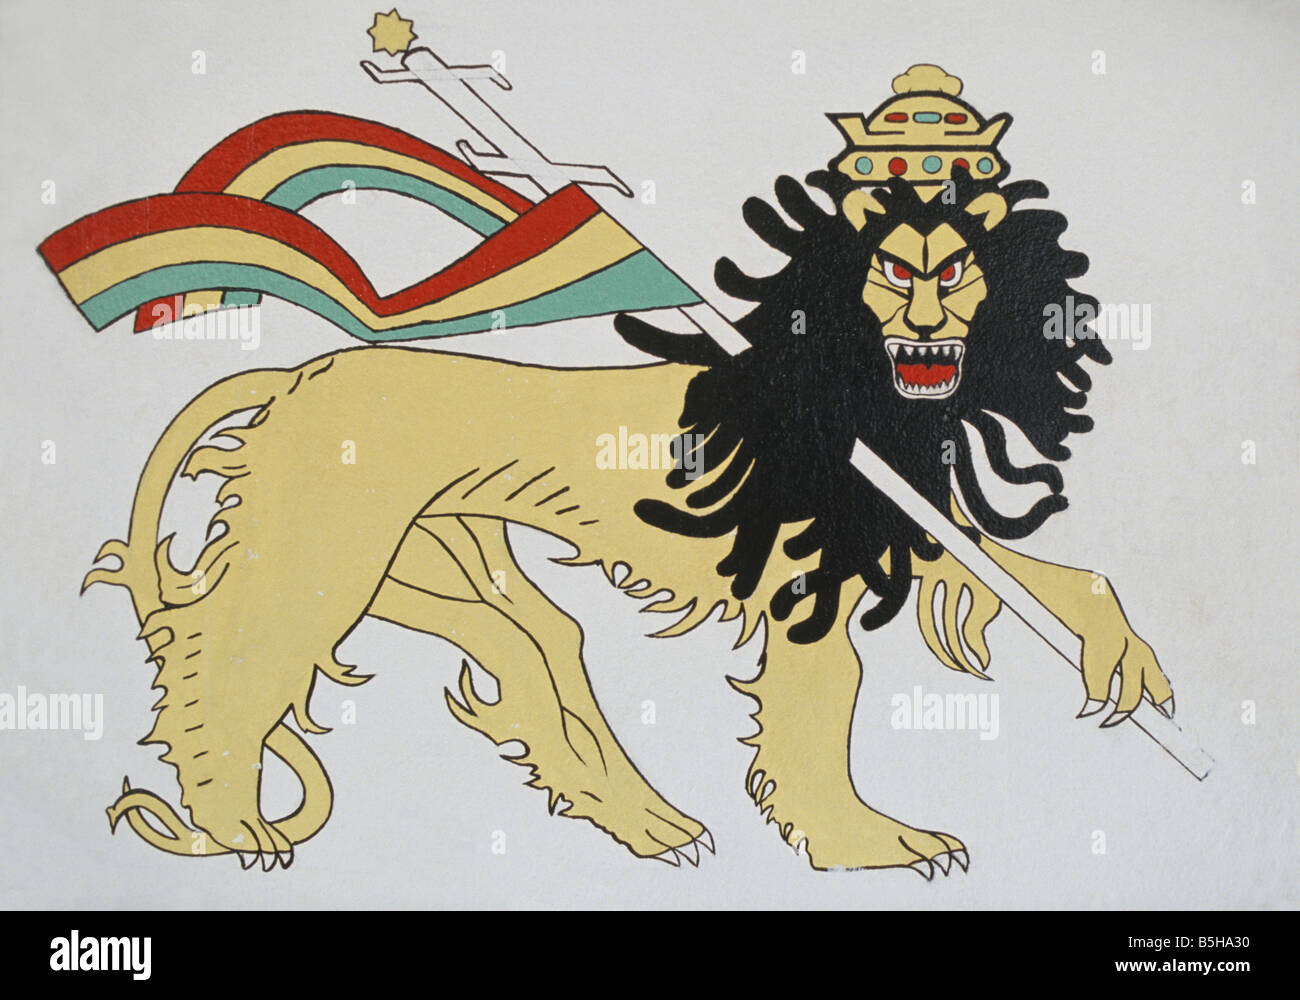 Rasta rastafarianism rastafarian stock photos rasta mural depicting a rastafarian lion of judah with dreadlocks in negril jamaica stock image biocorpaavc Image collections